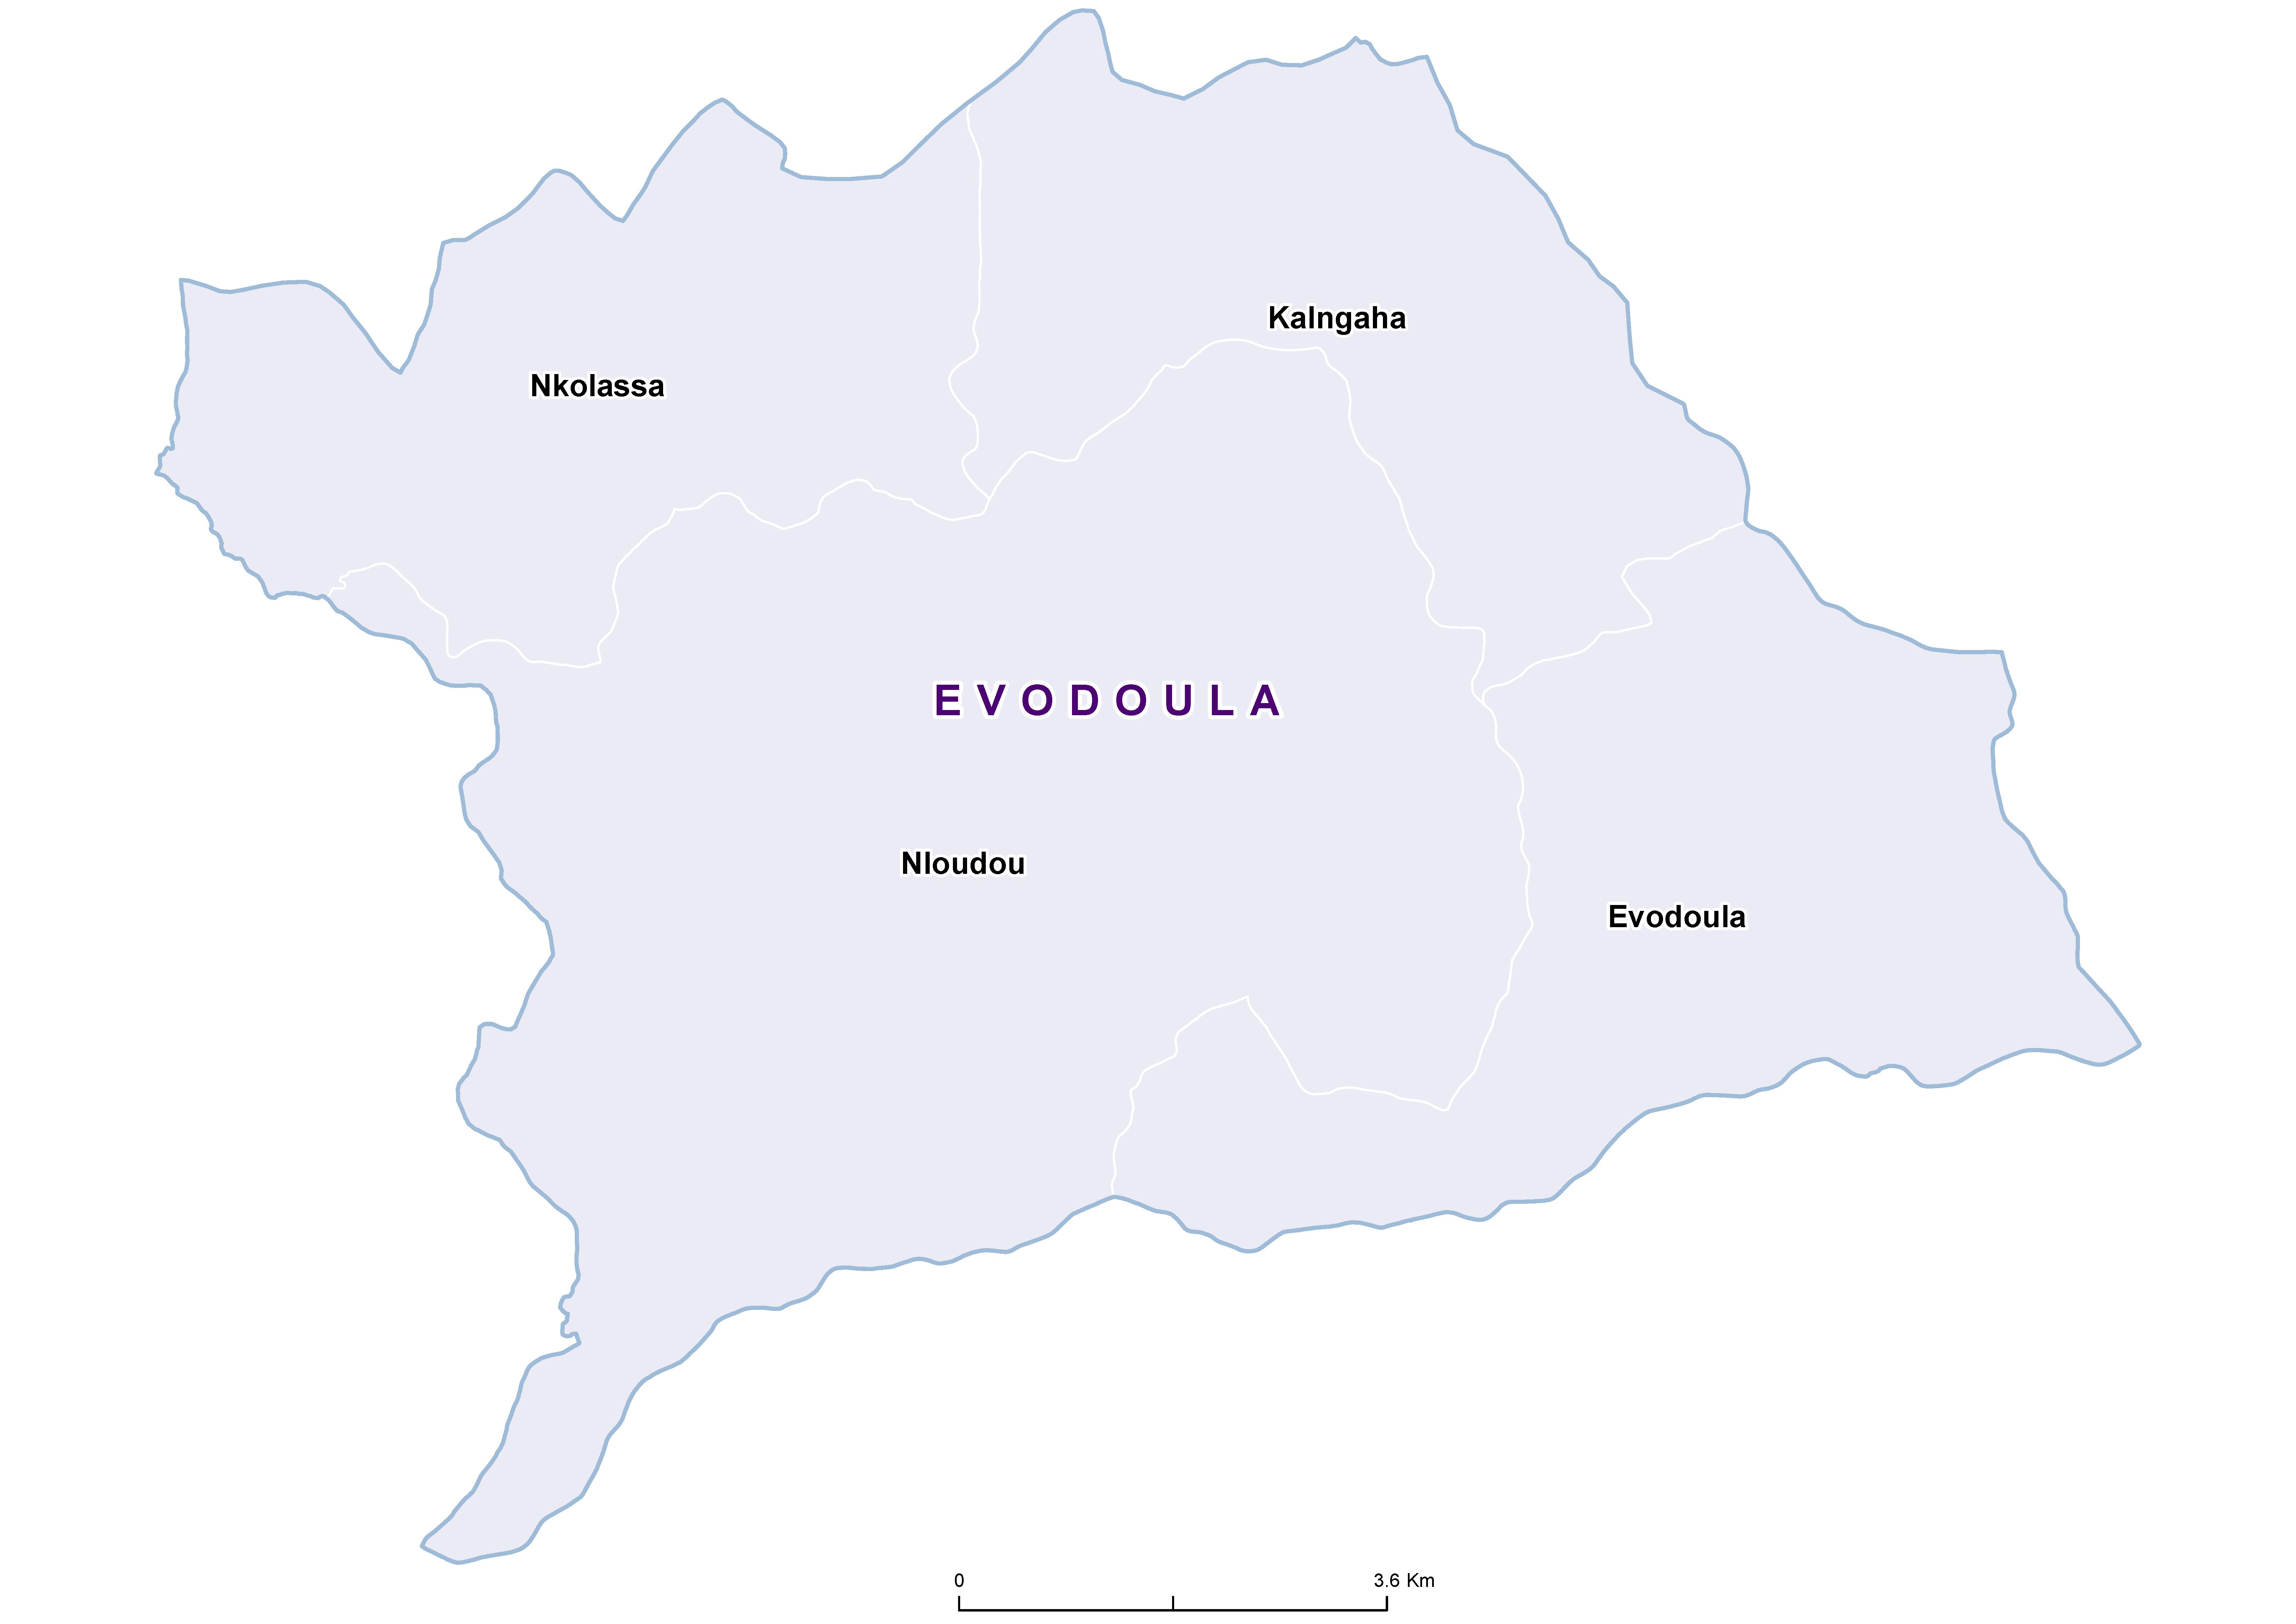 Evodoula STH 20180001